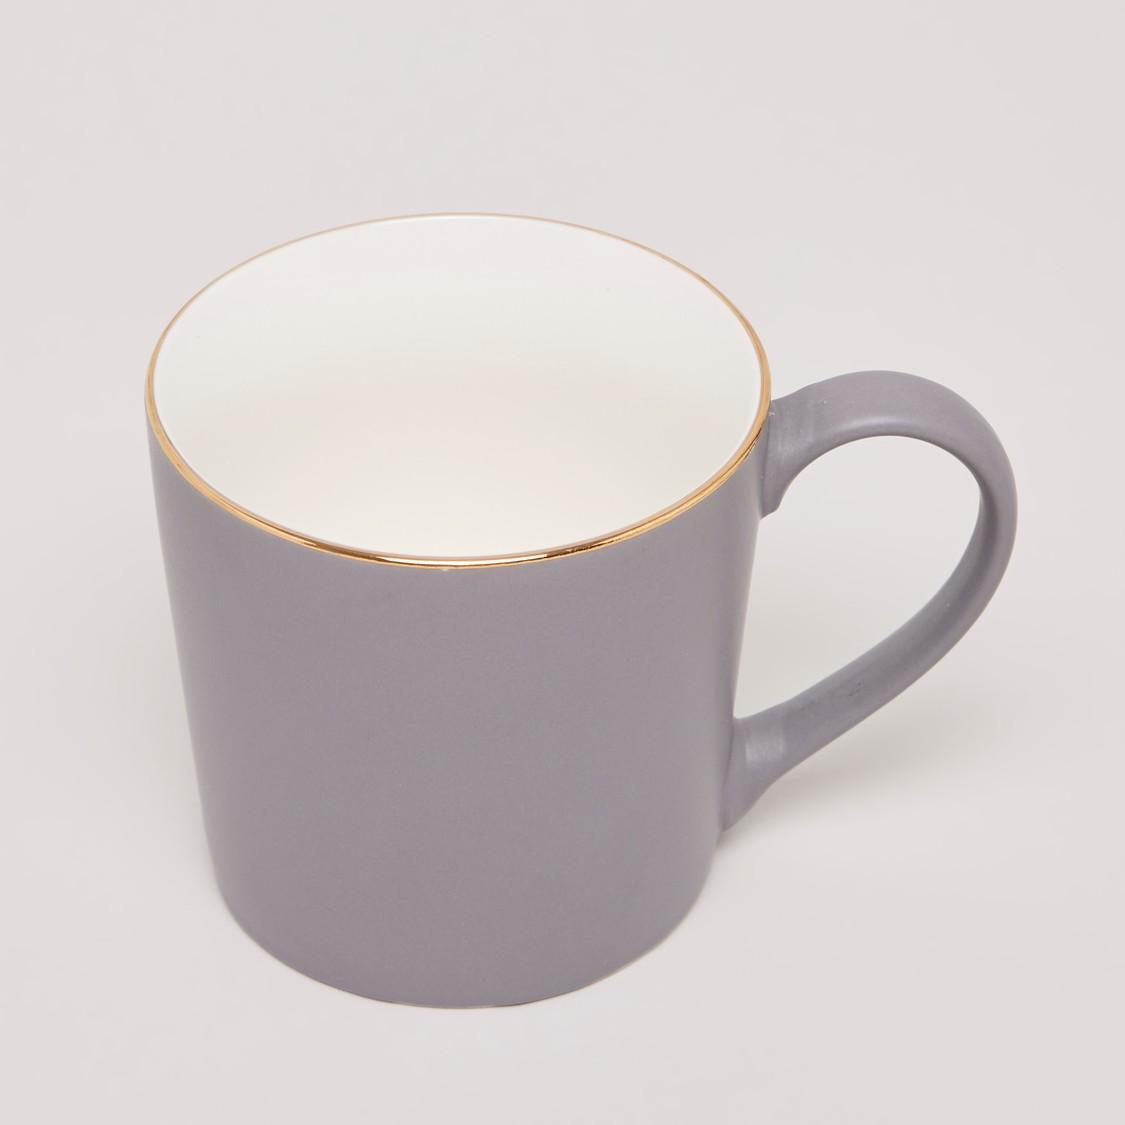 Plain Mug with Handle